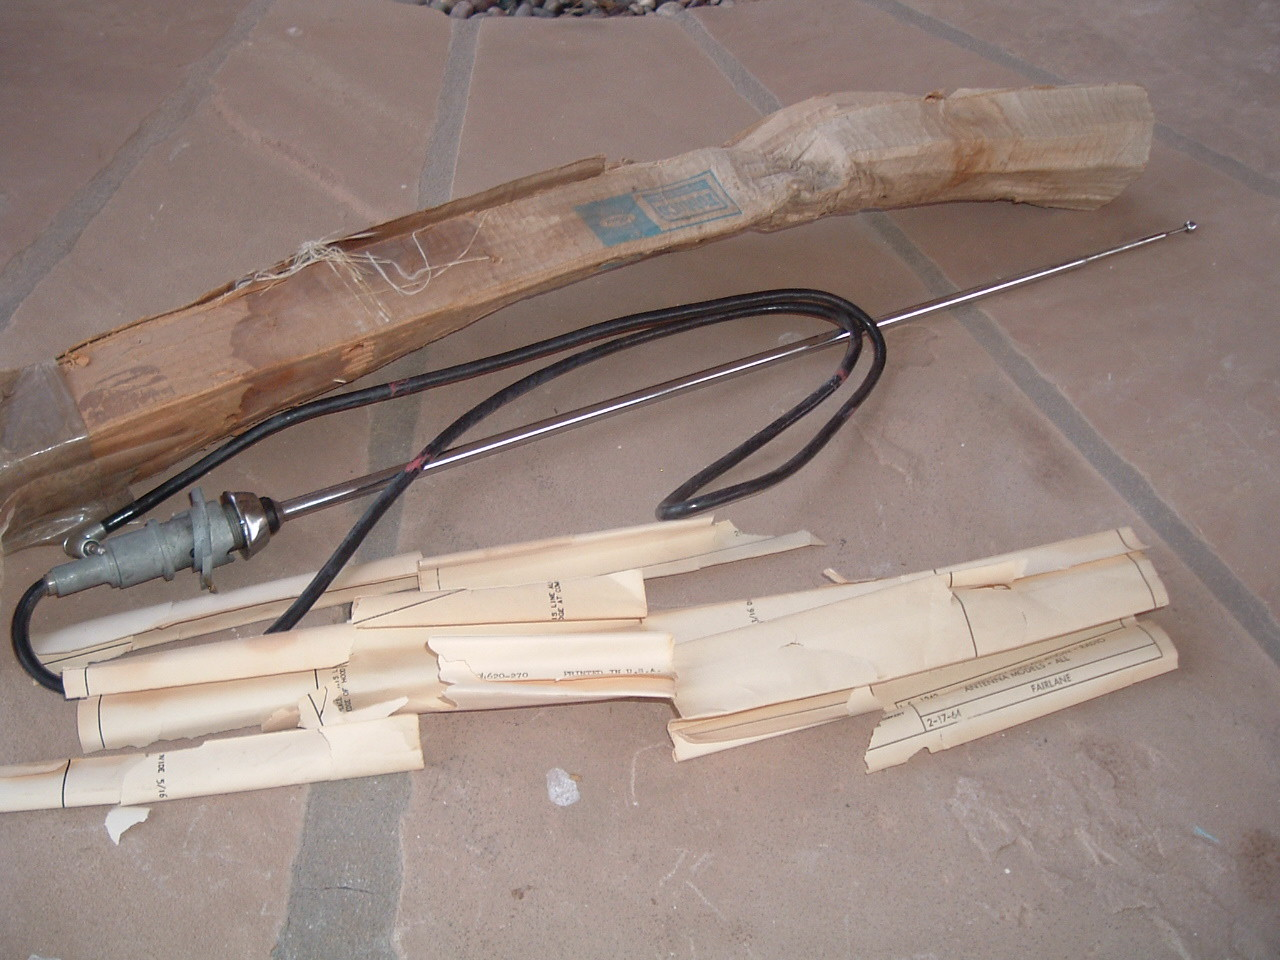 1964 ford fairlane radio antenna kit nos ford C40Z-18813-A (1) (z c40z18813a)